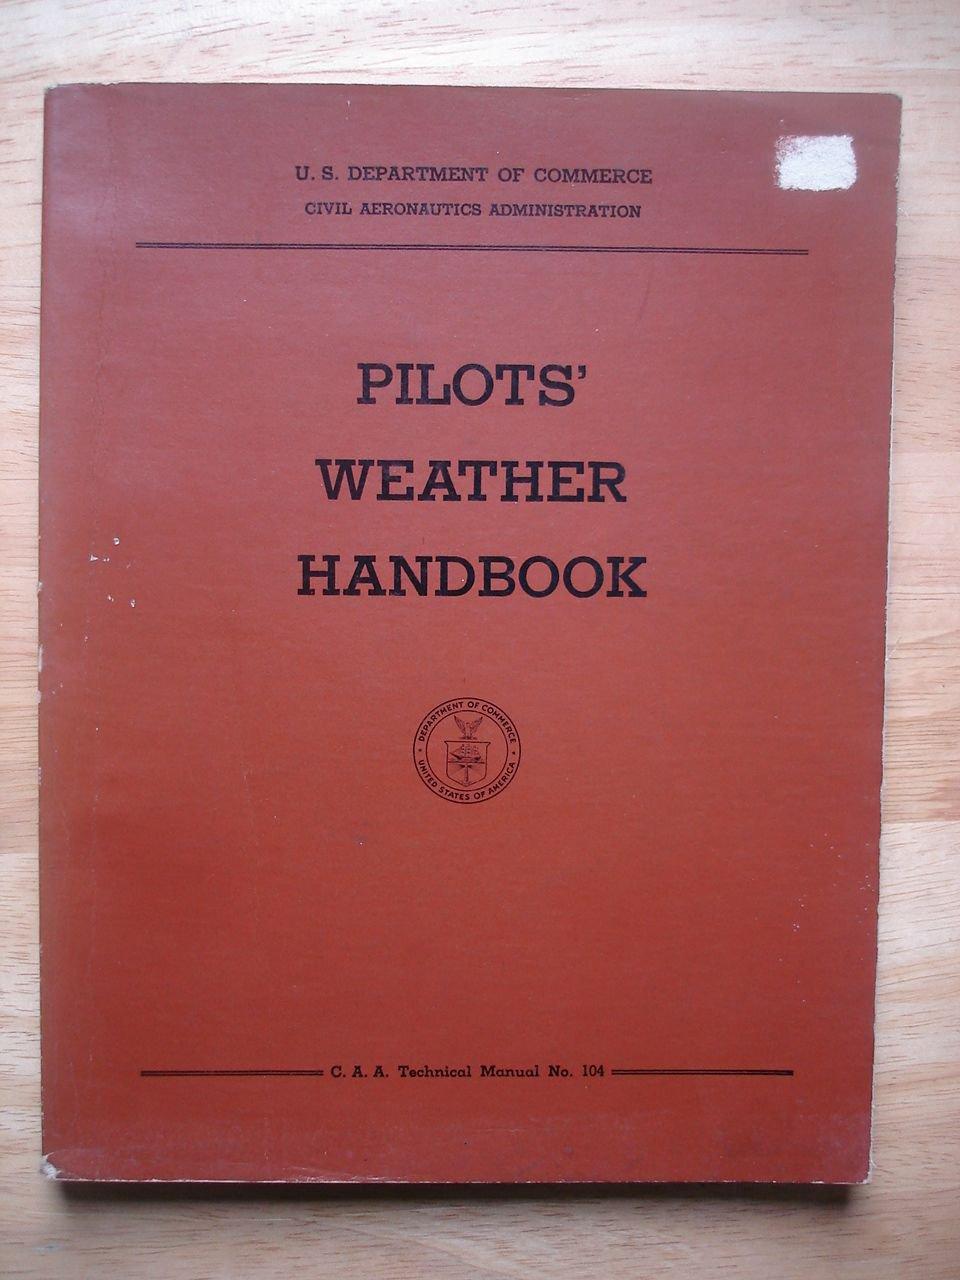 Pilot�s Weather Handbook C. A. A. Technical Manual No. 104